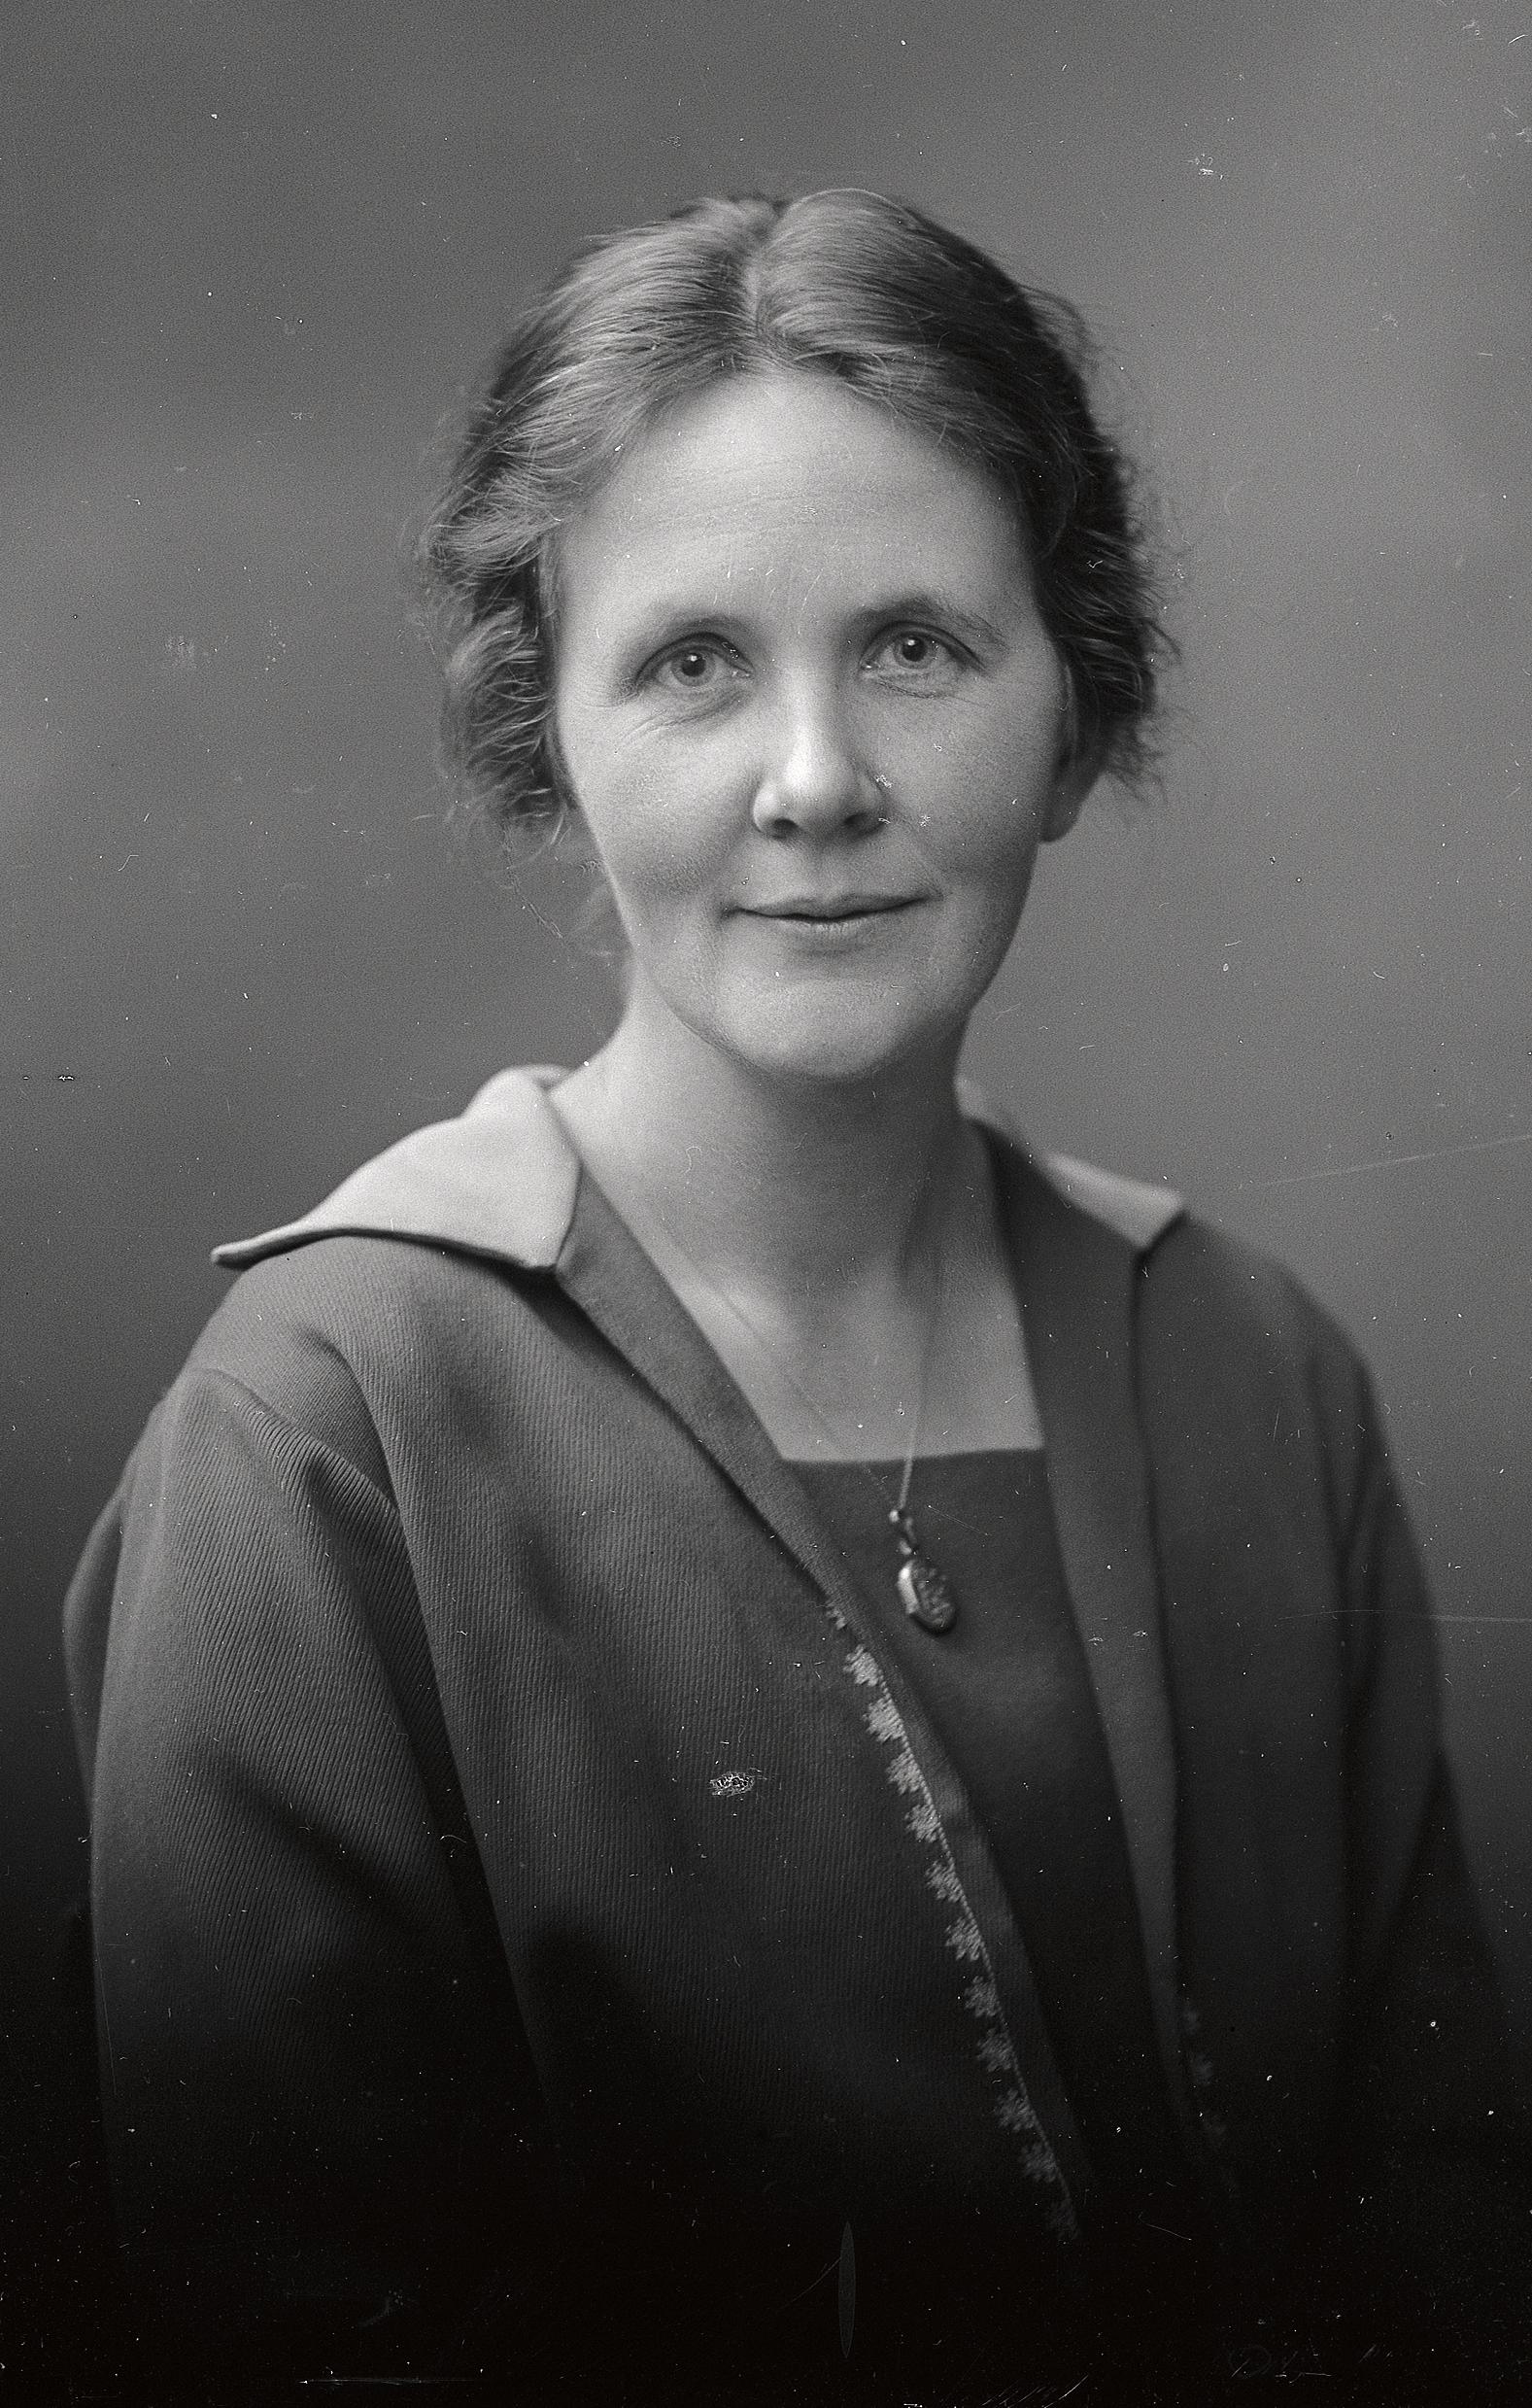 Ingeborg Bosson, 1923. Photographer: Per Bagge (1866-1936). Per Bagges bildsamling, Lund University Library